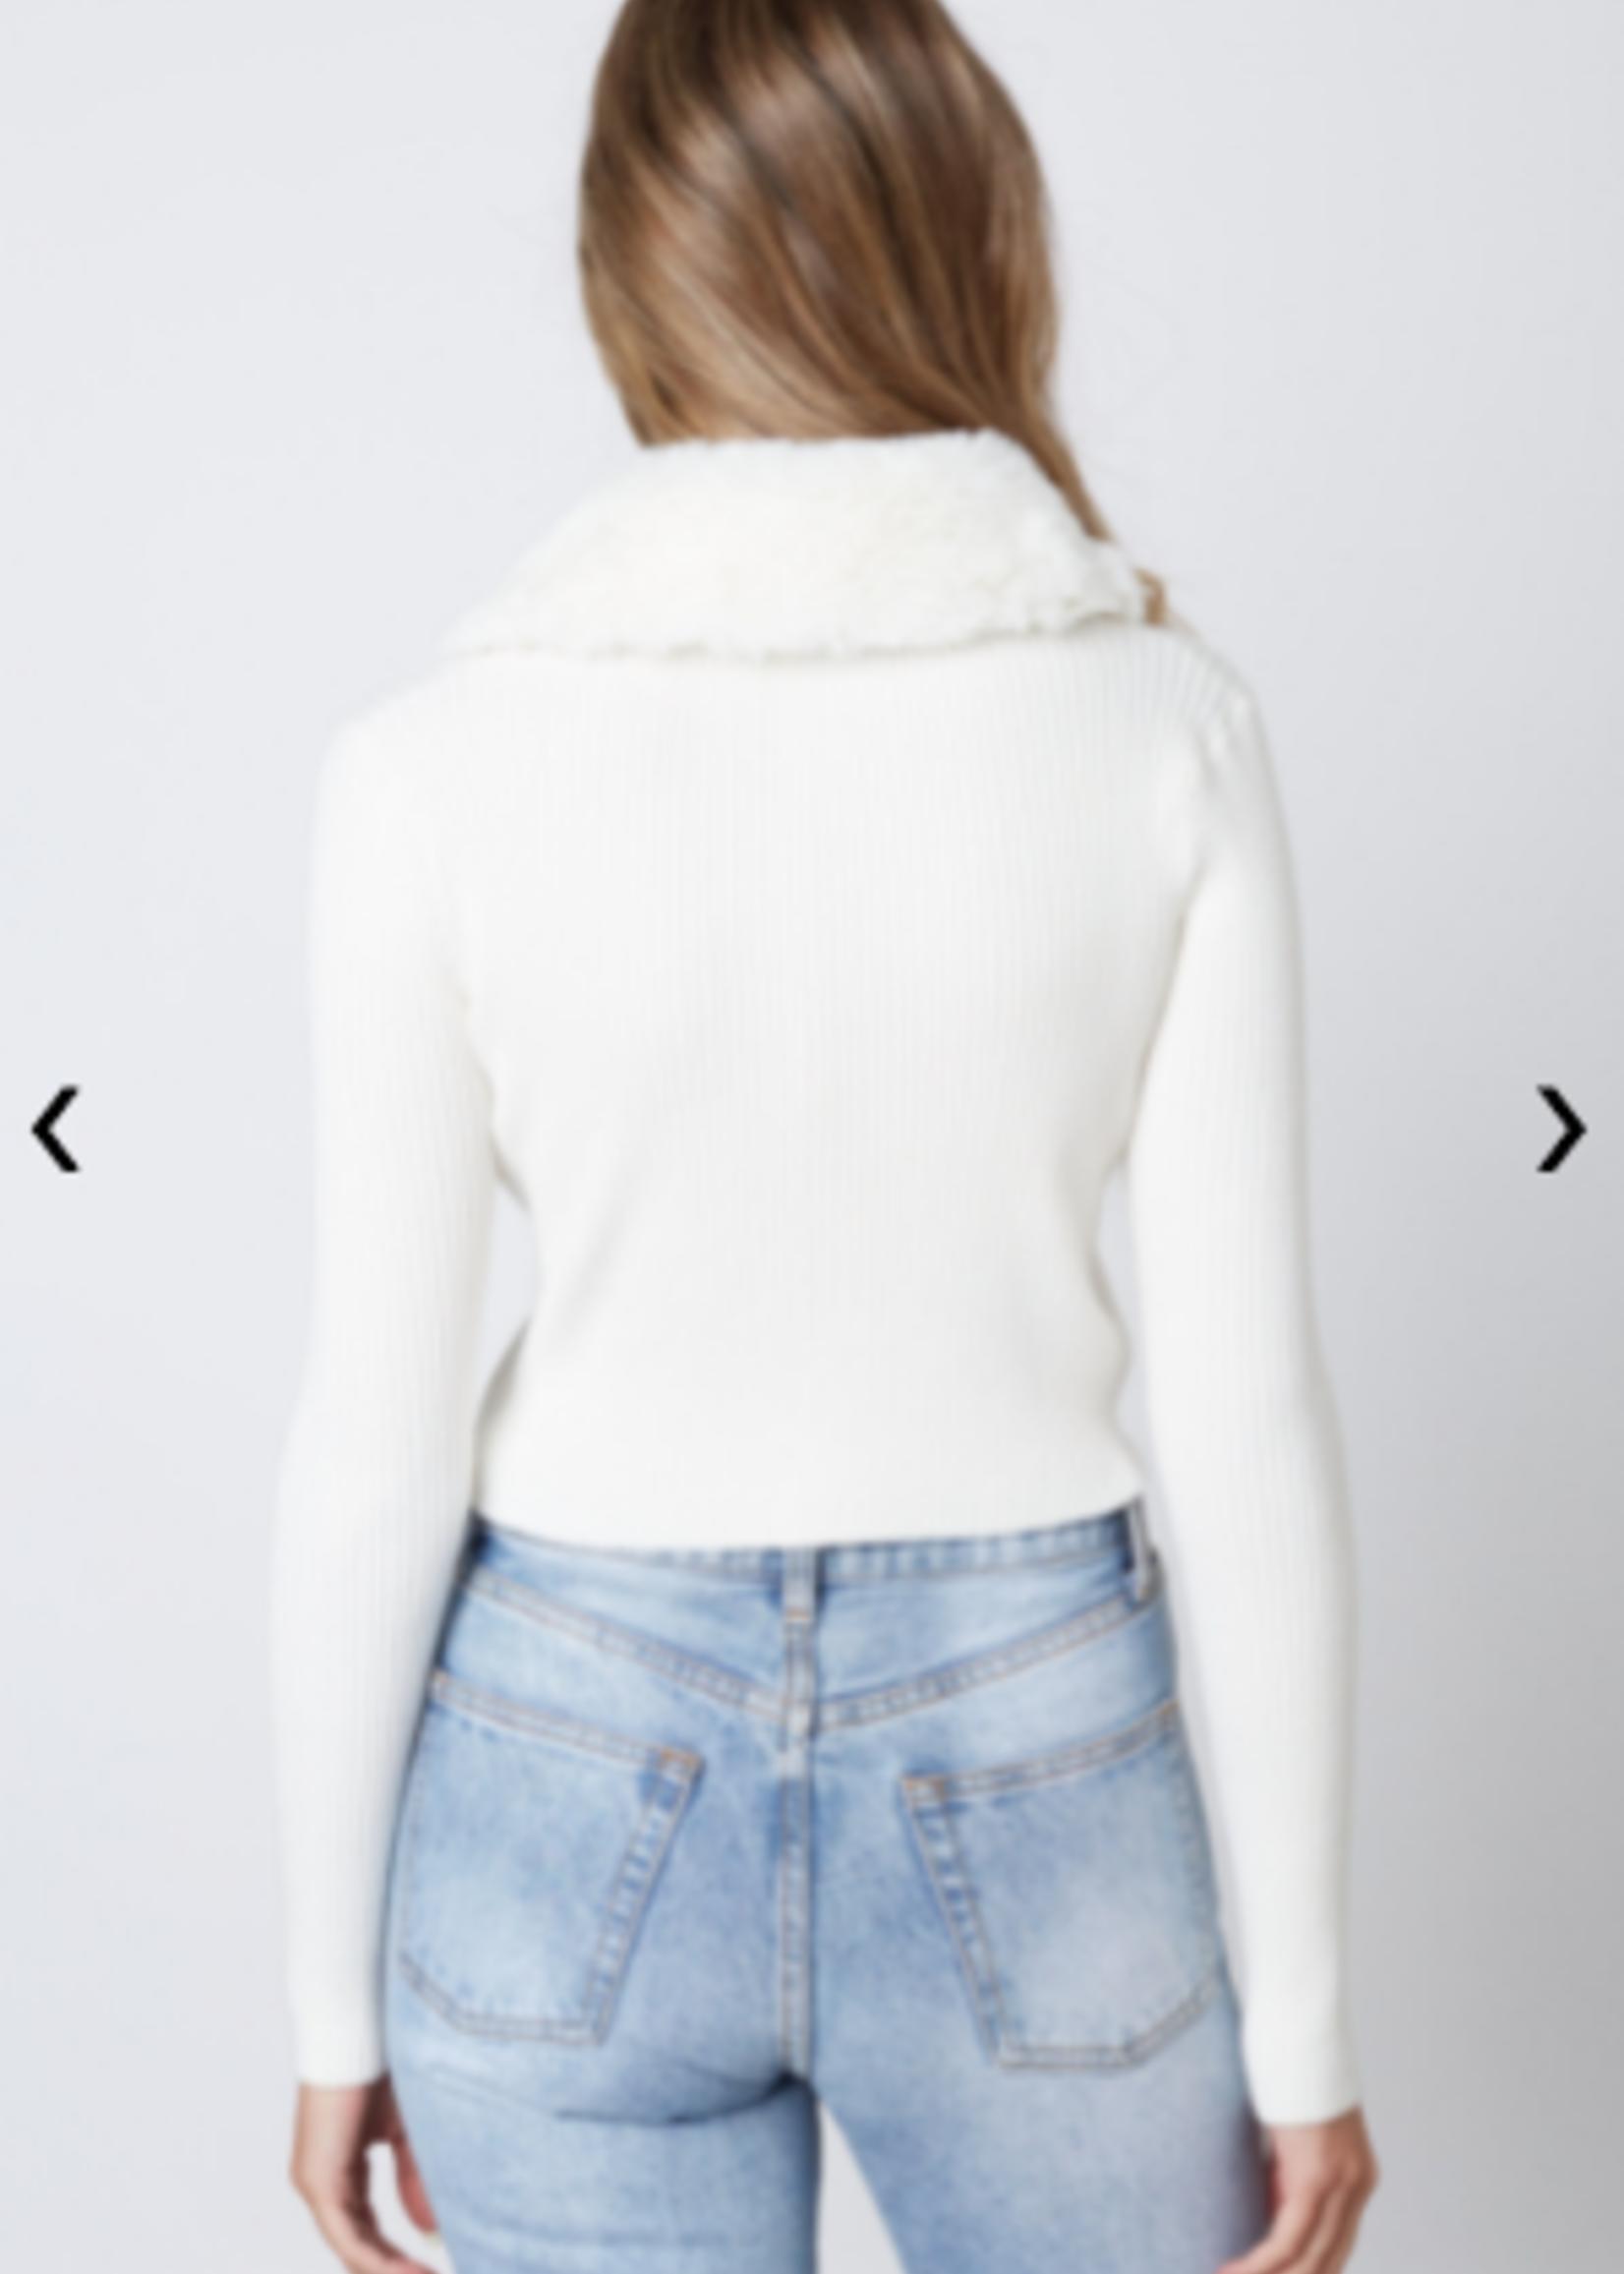 Furry Winter White Sweater